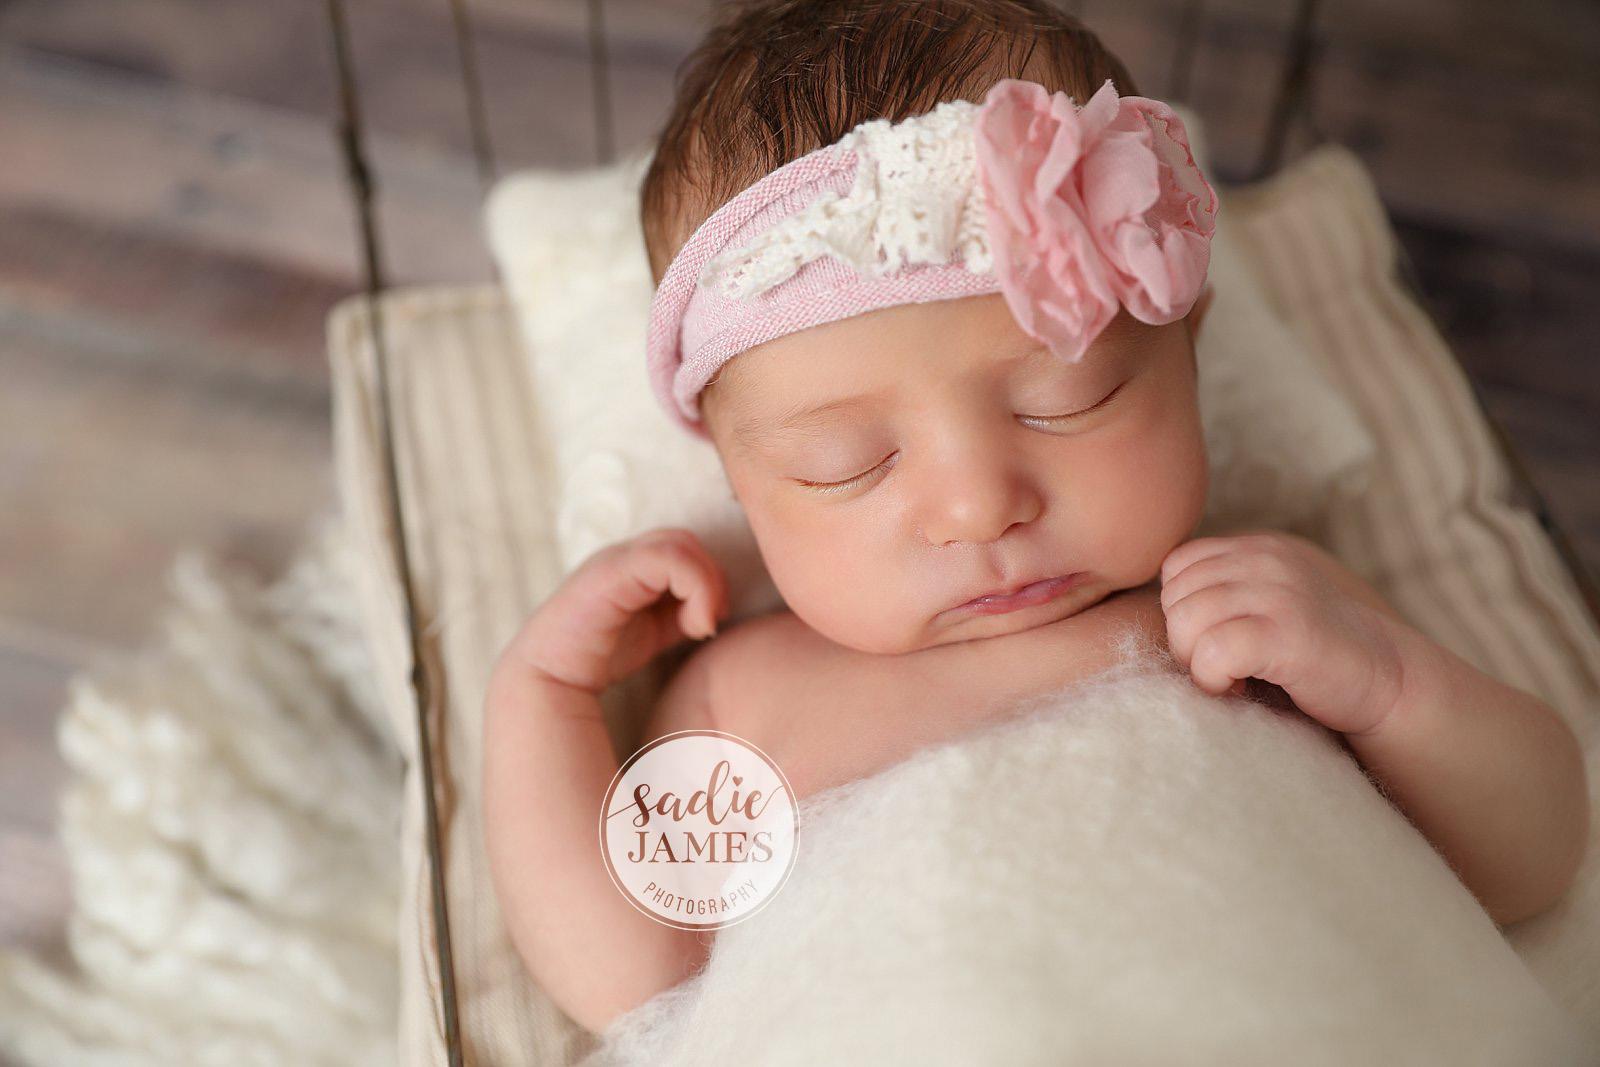 Sadie James Photography | Orange CA newborn photographer | California newborn photographer | CA newborn photographer | Orange County newborn photographer | Destination newborn photographer | newborn photography